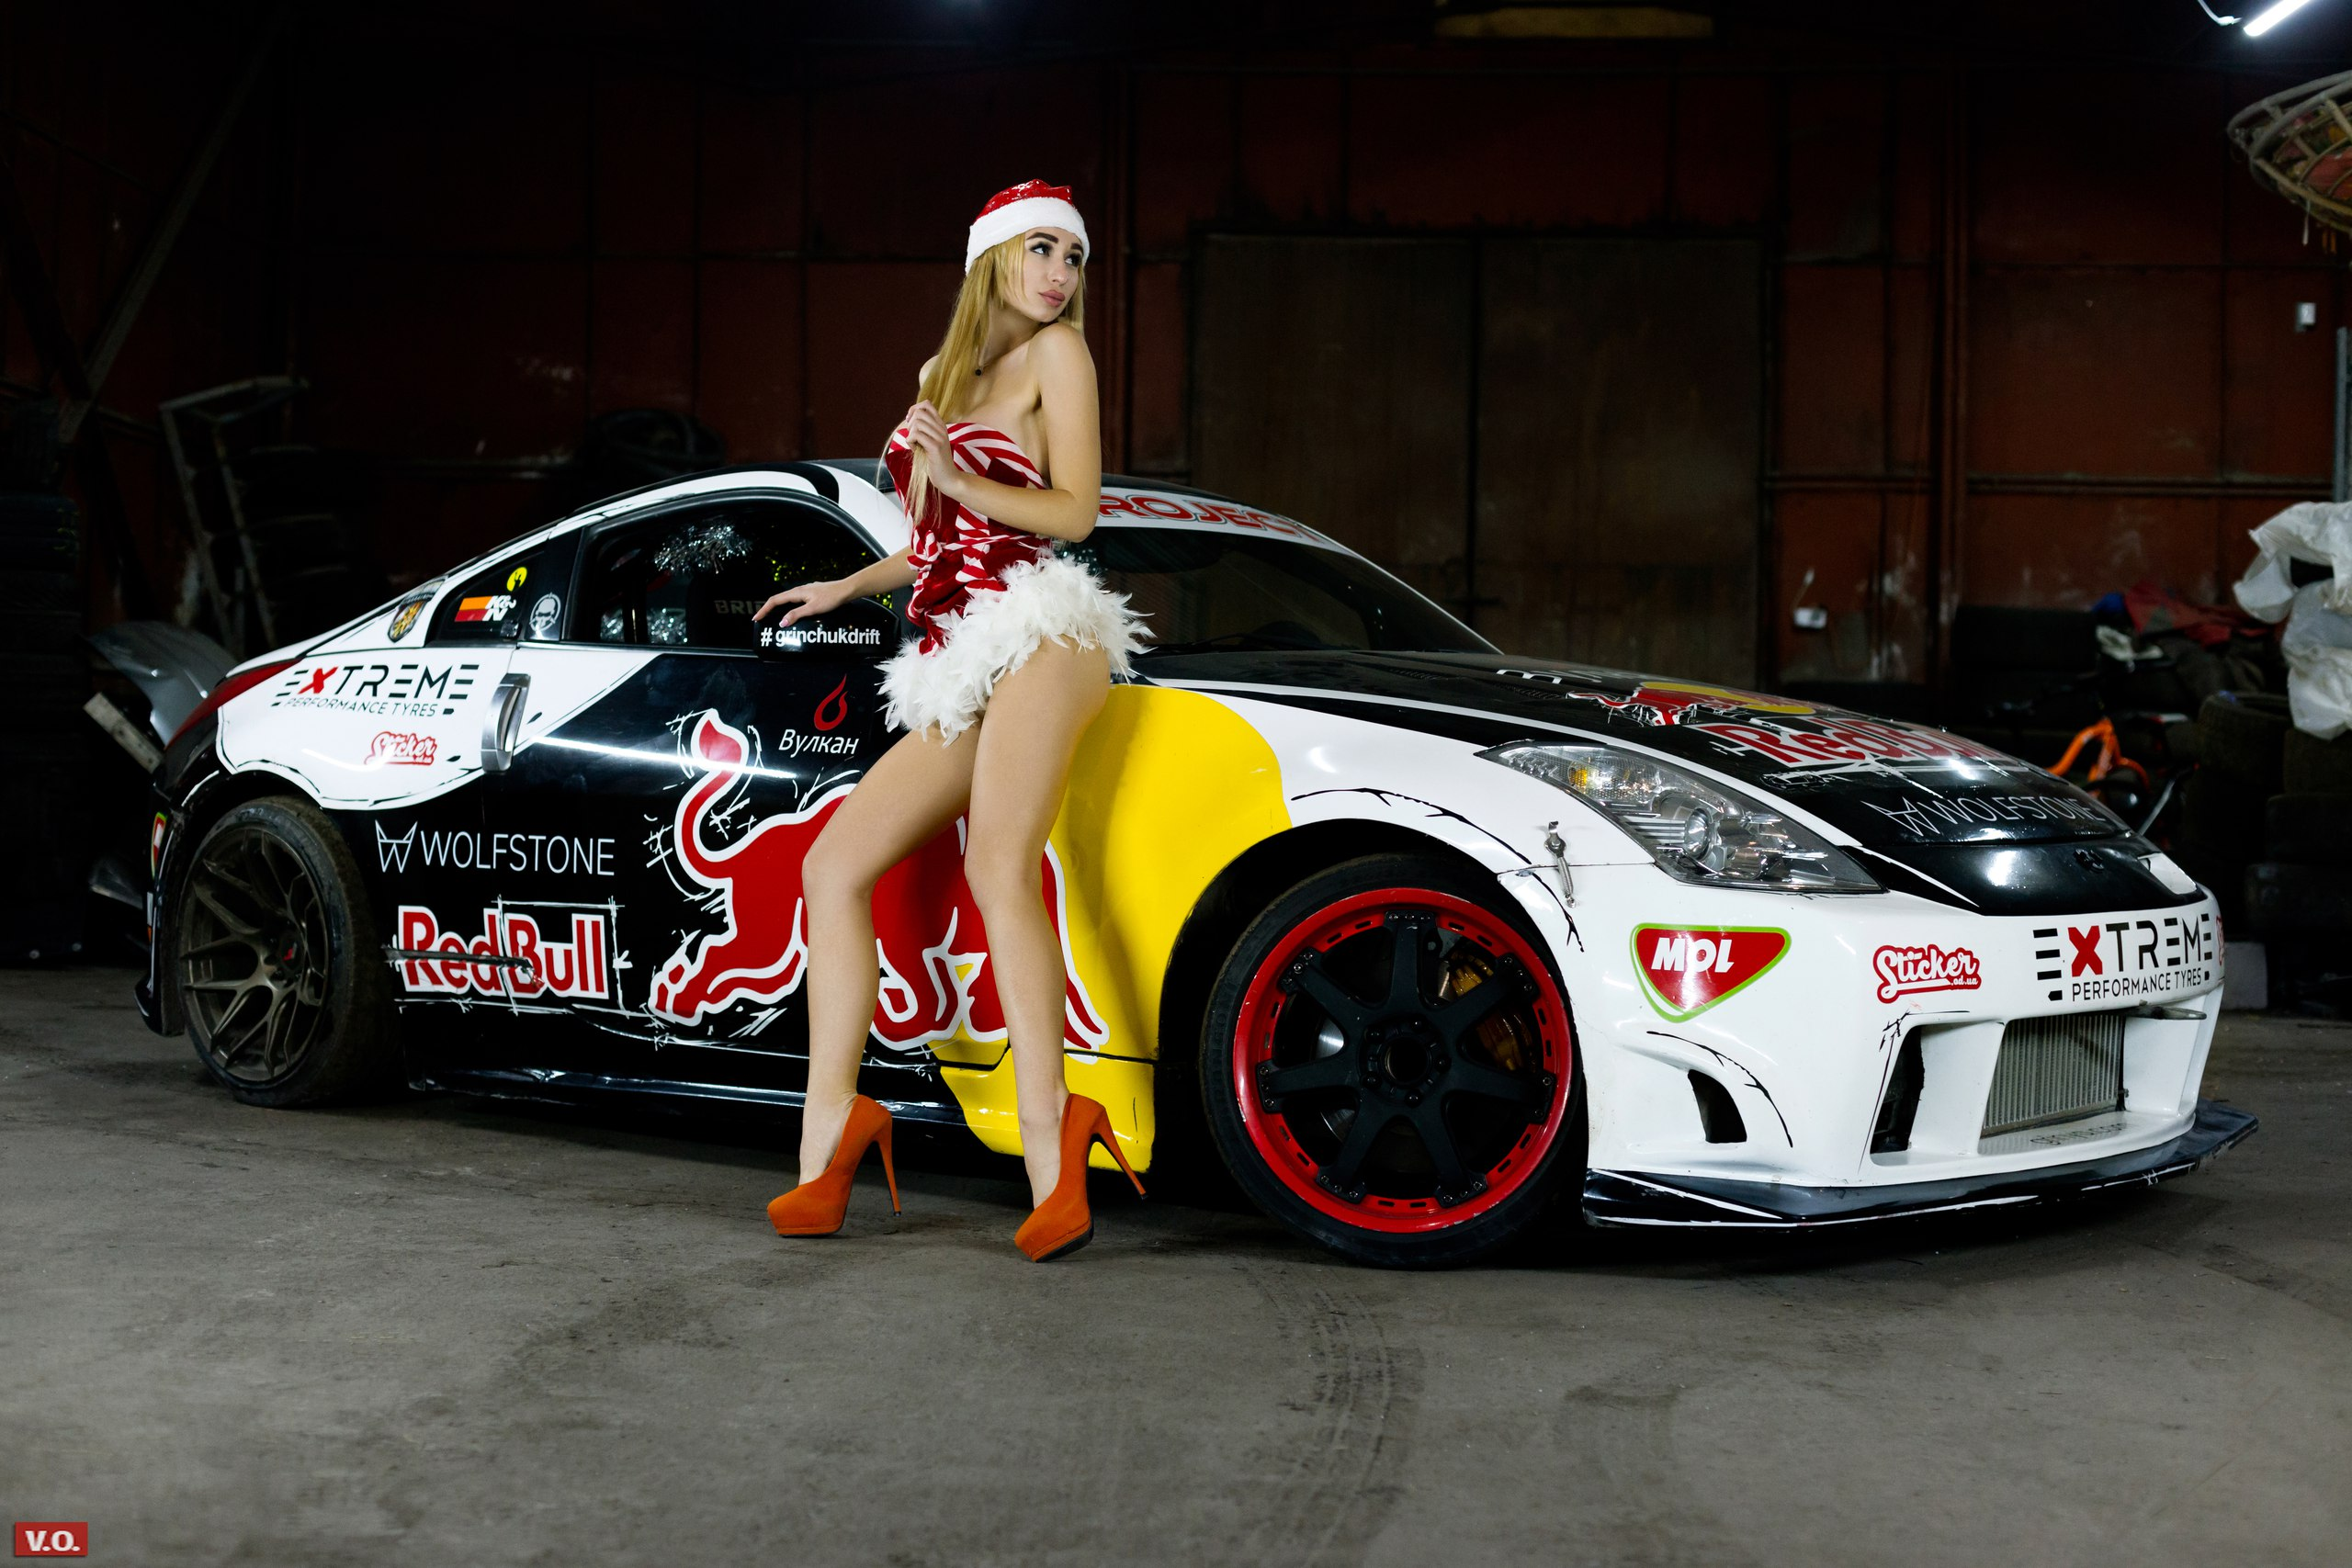 People 2560x1707 women blonde women with cars high heels Santa hats ass Santa costume Red Bull